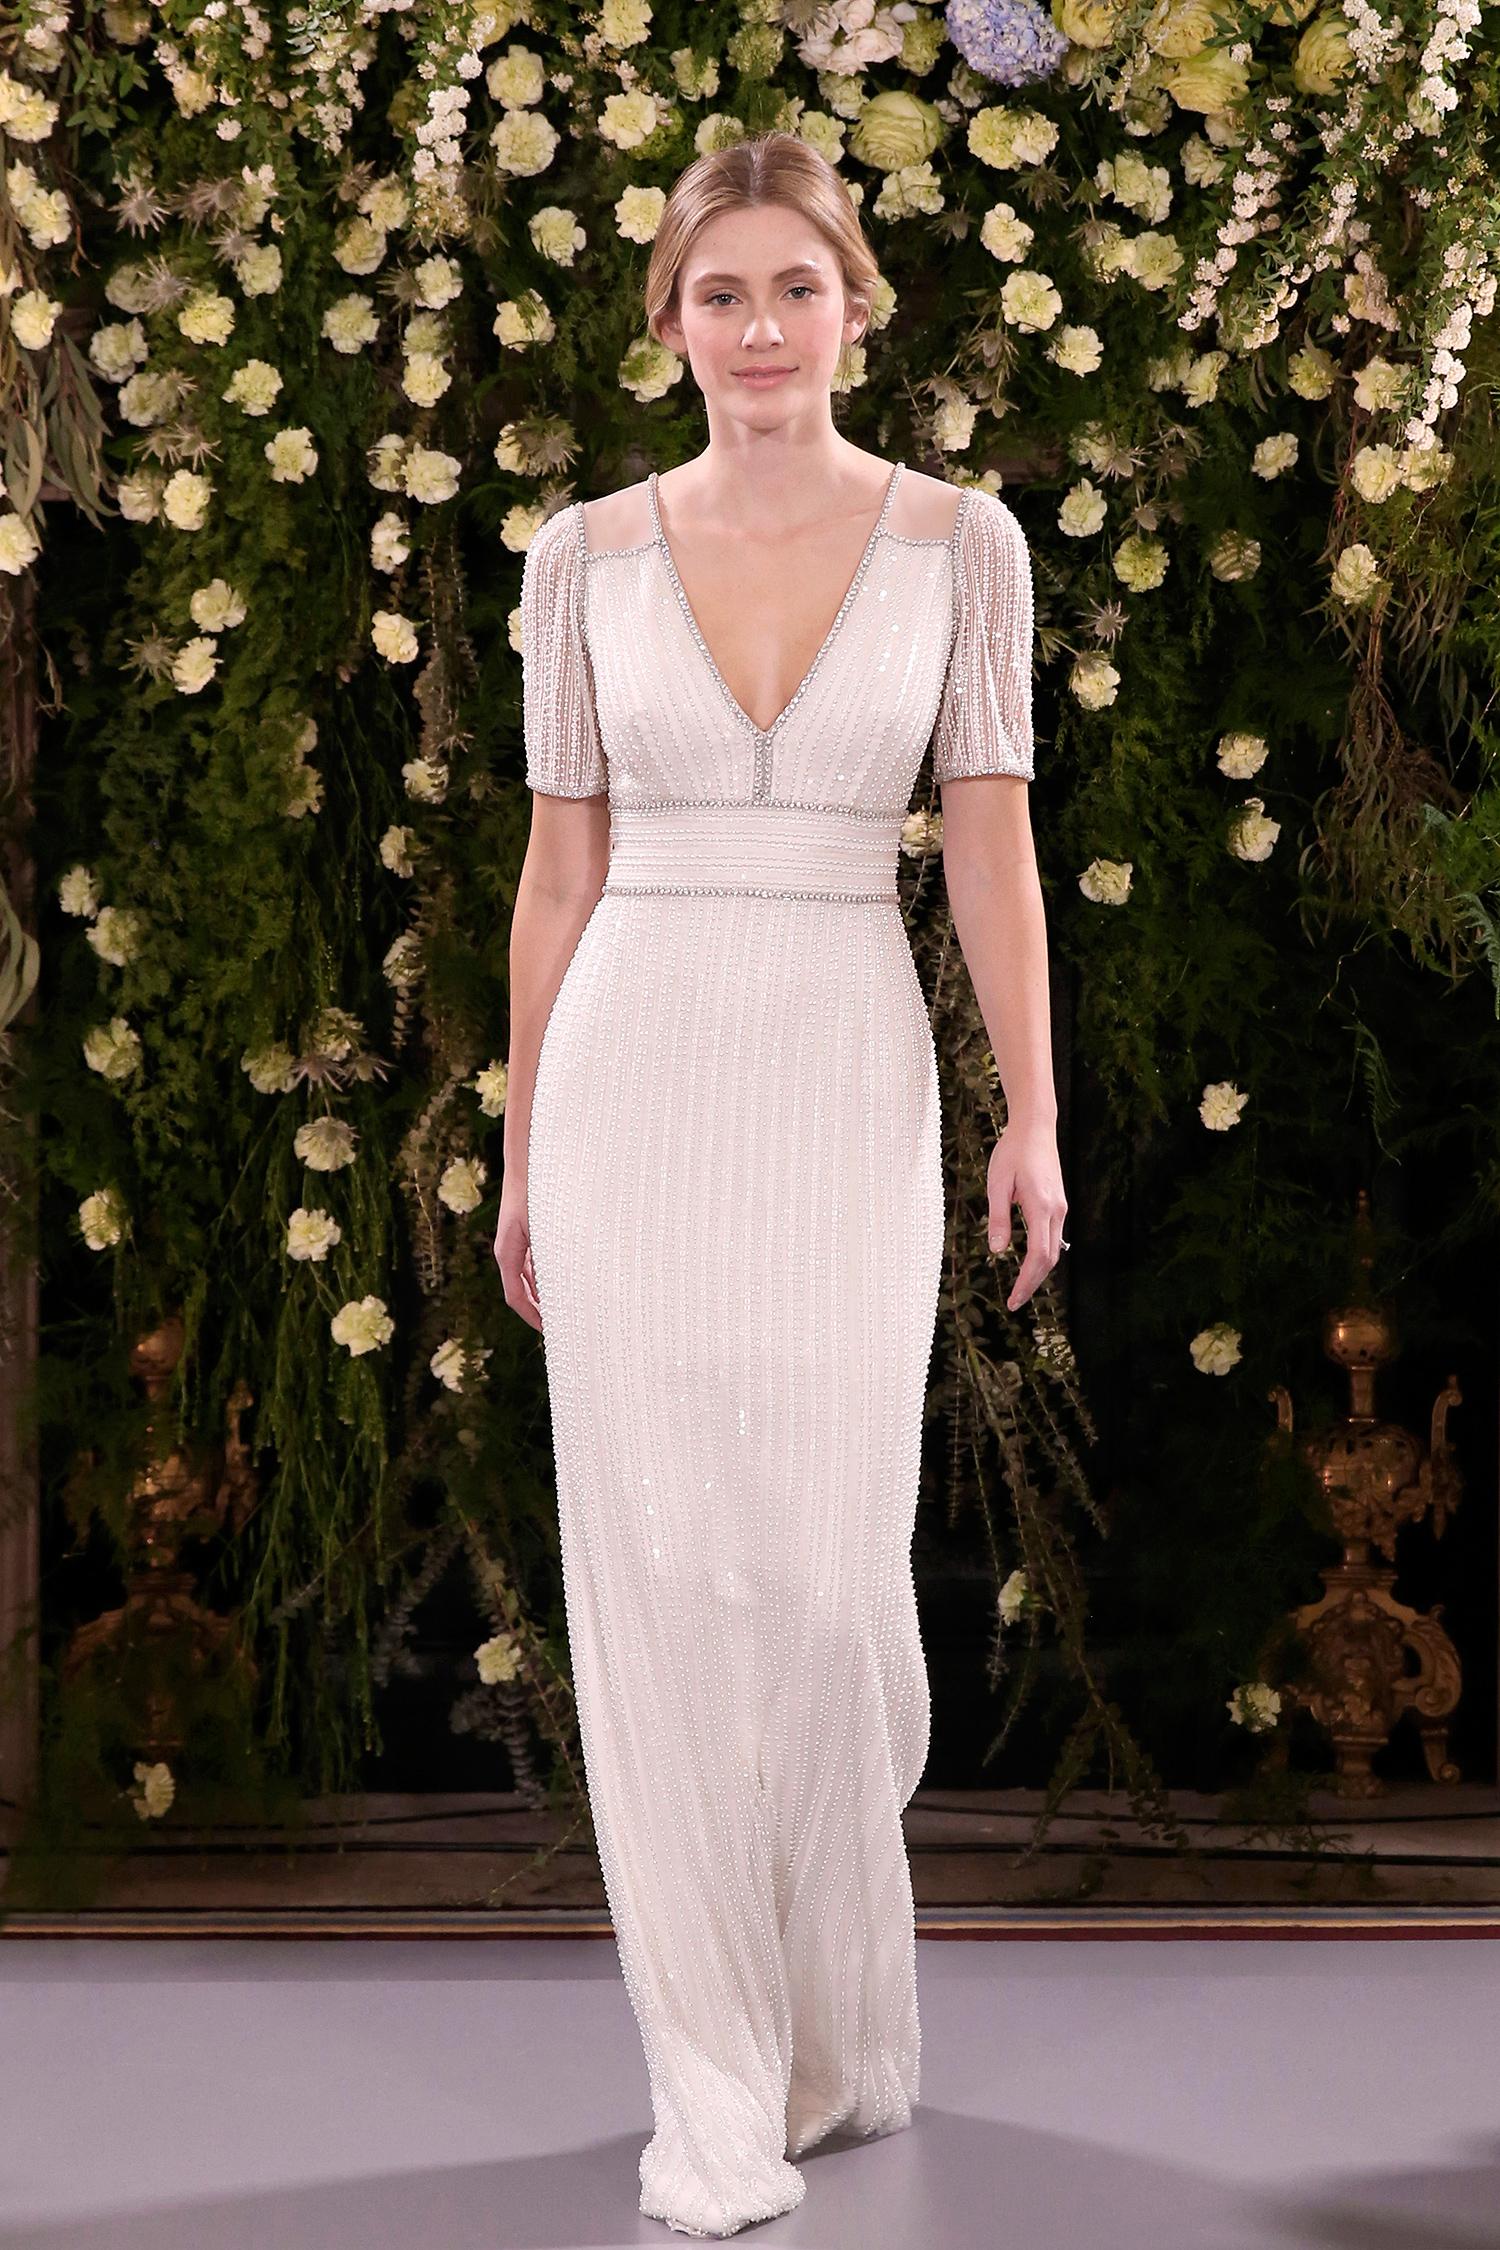 jenny packham wedding dress spring 2019 v-neck sheath with beadwork